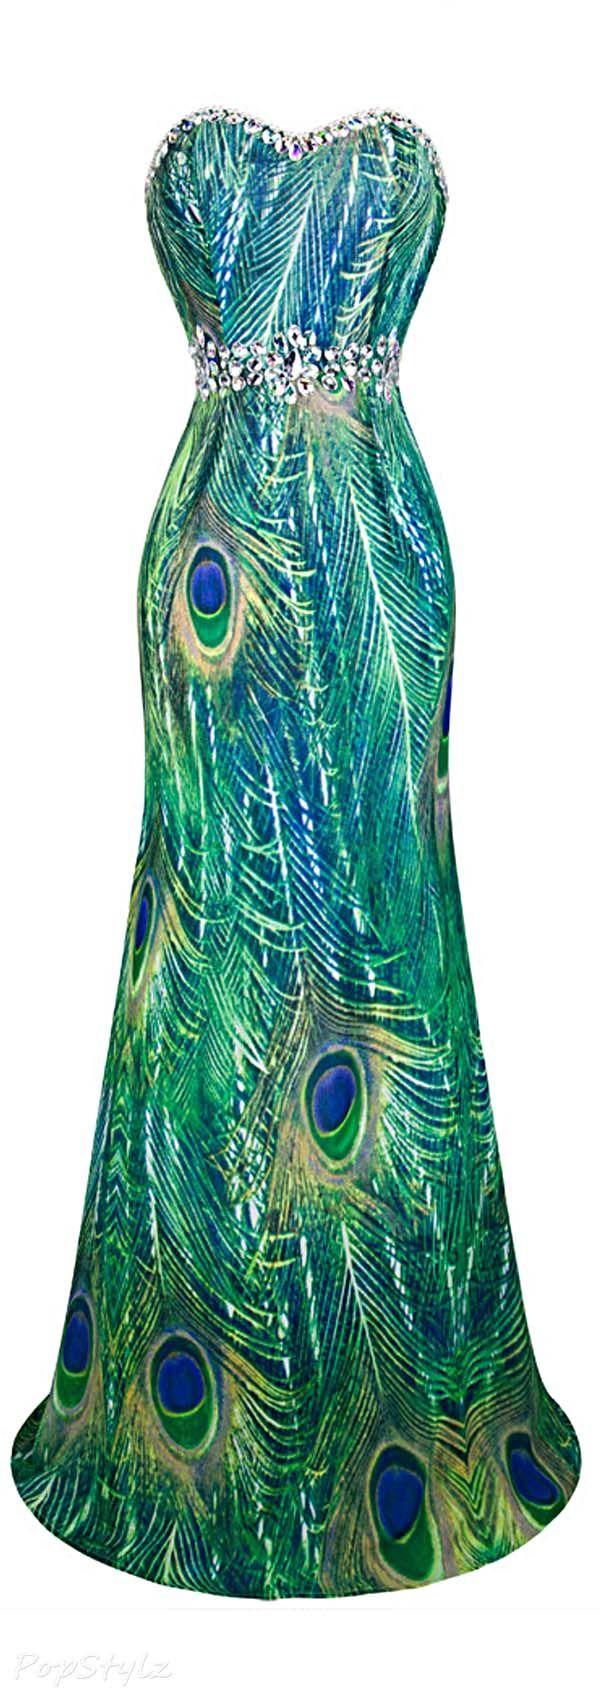 Angel-fashions Rhinestone Peacock Evening Dress jaglady